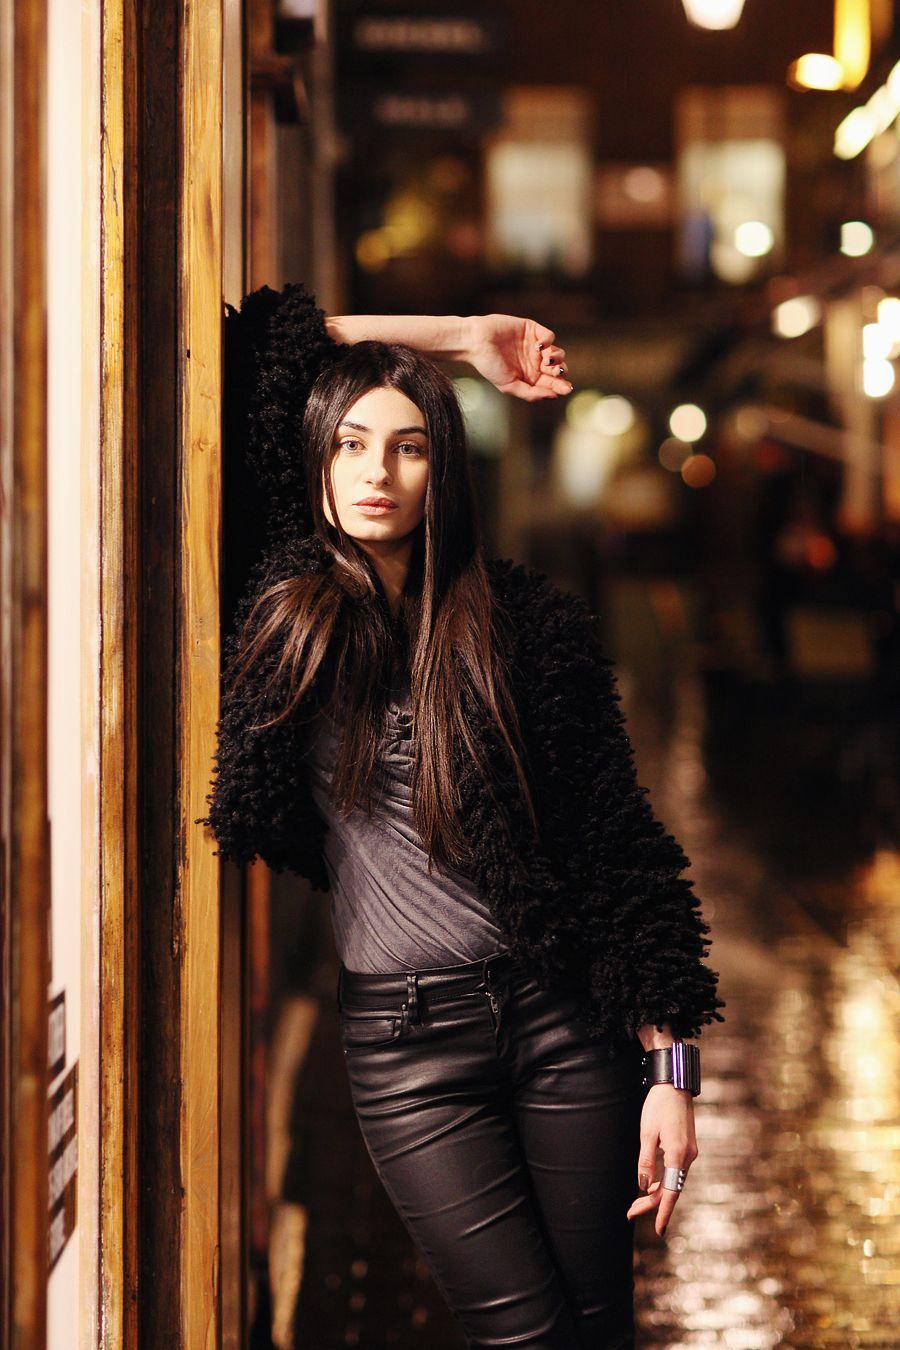 Night Photoshoot in Soho, London | Night photography portrait, Street photography portrait, Street fashion photography